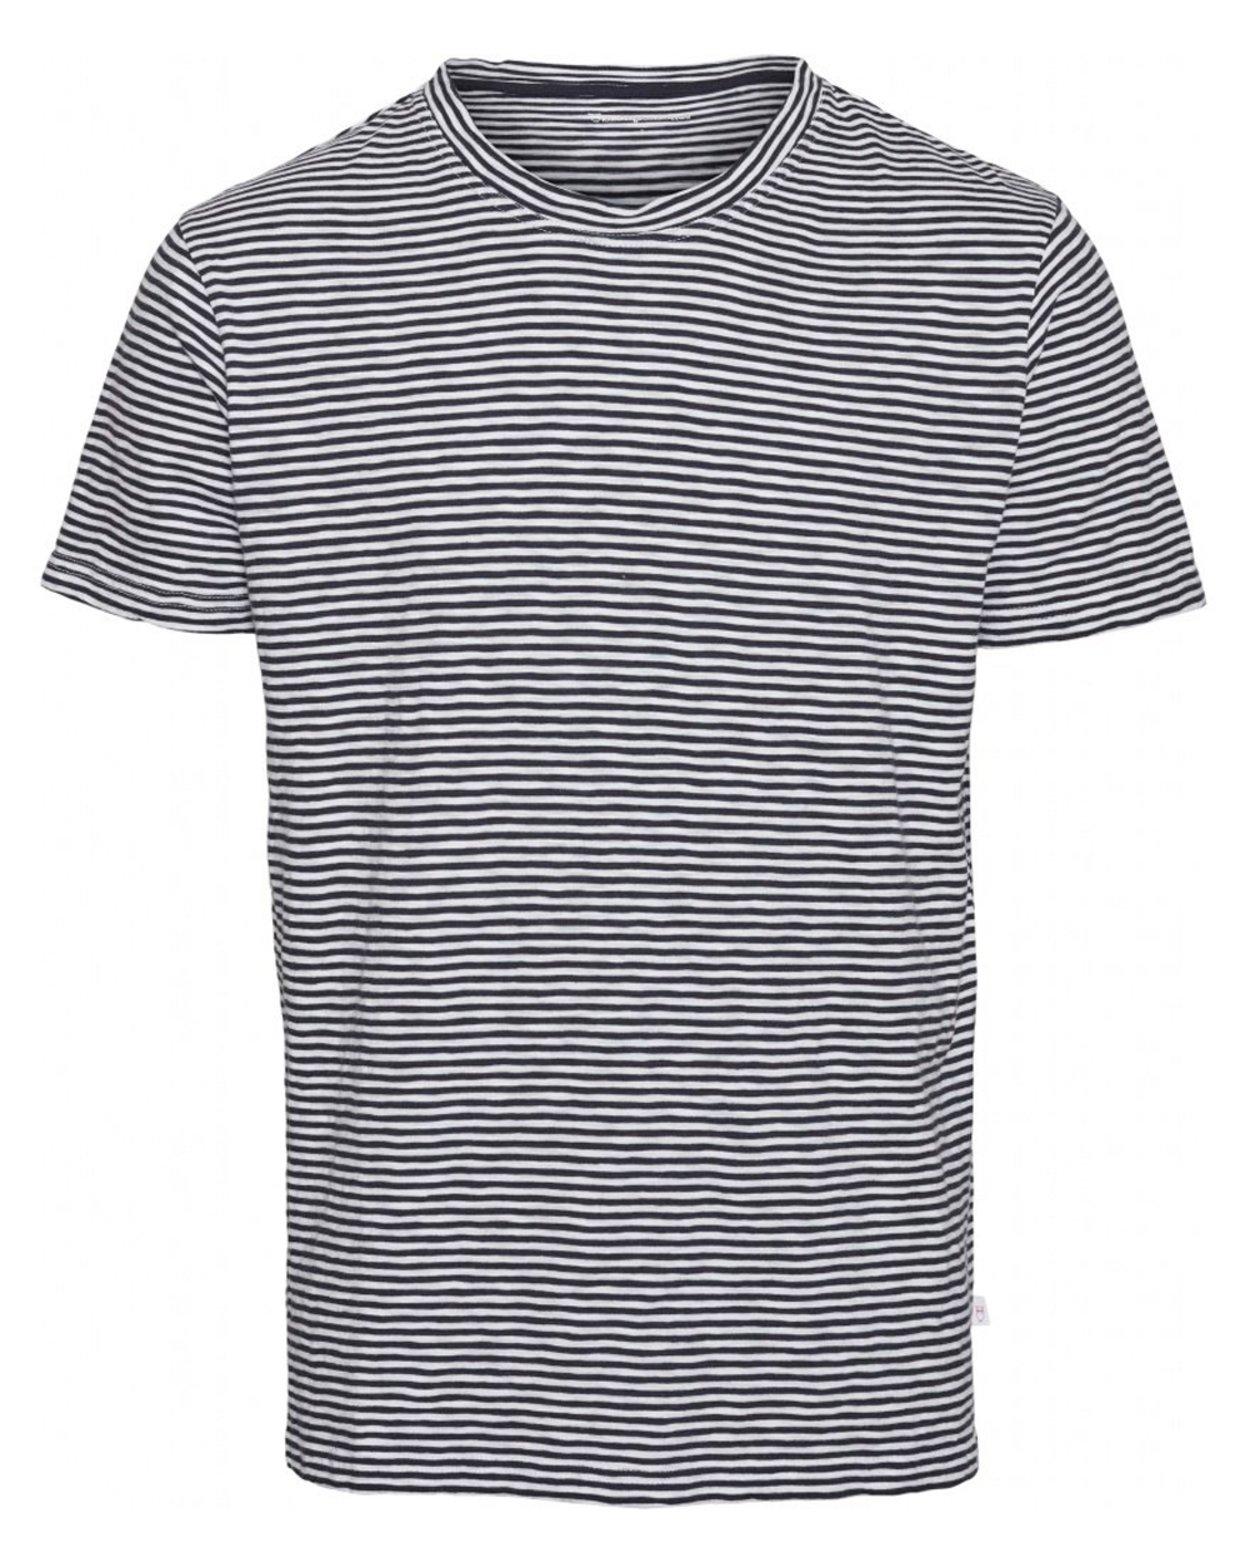 Alder Narrow Striped Tee-Shirt